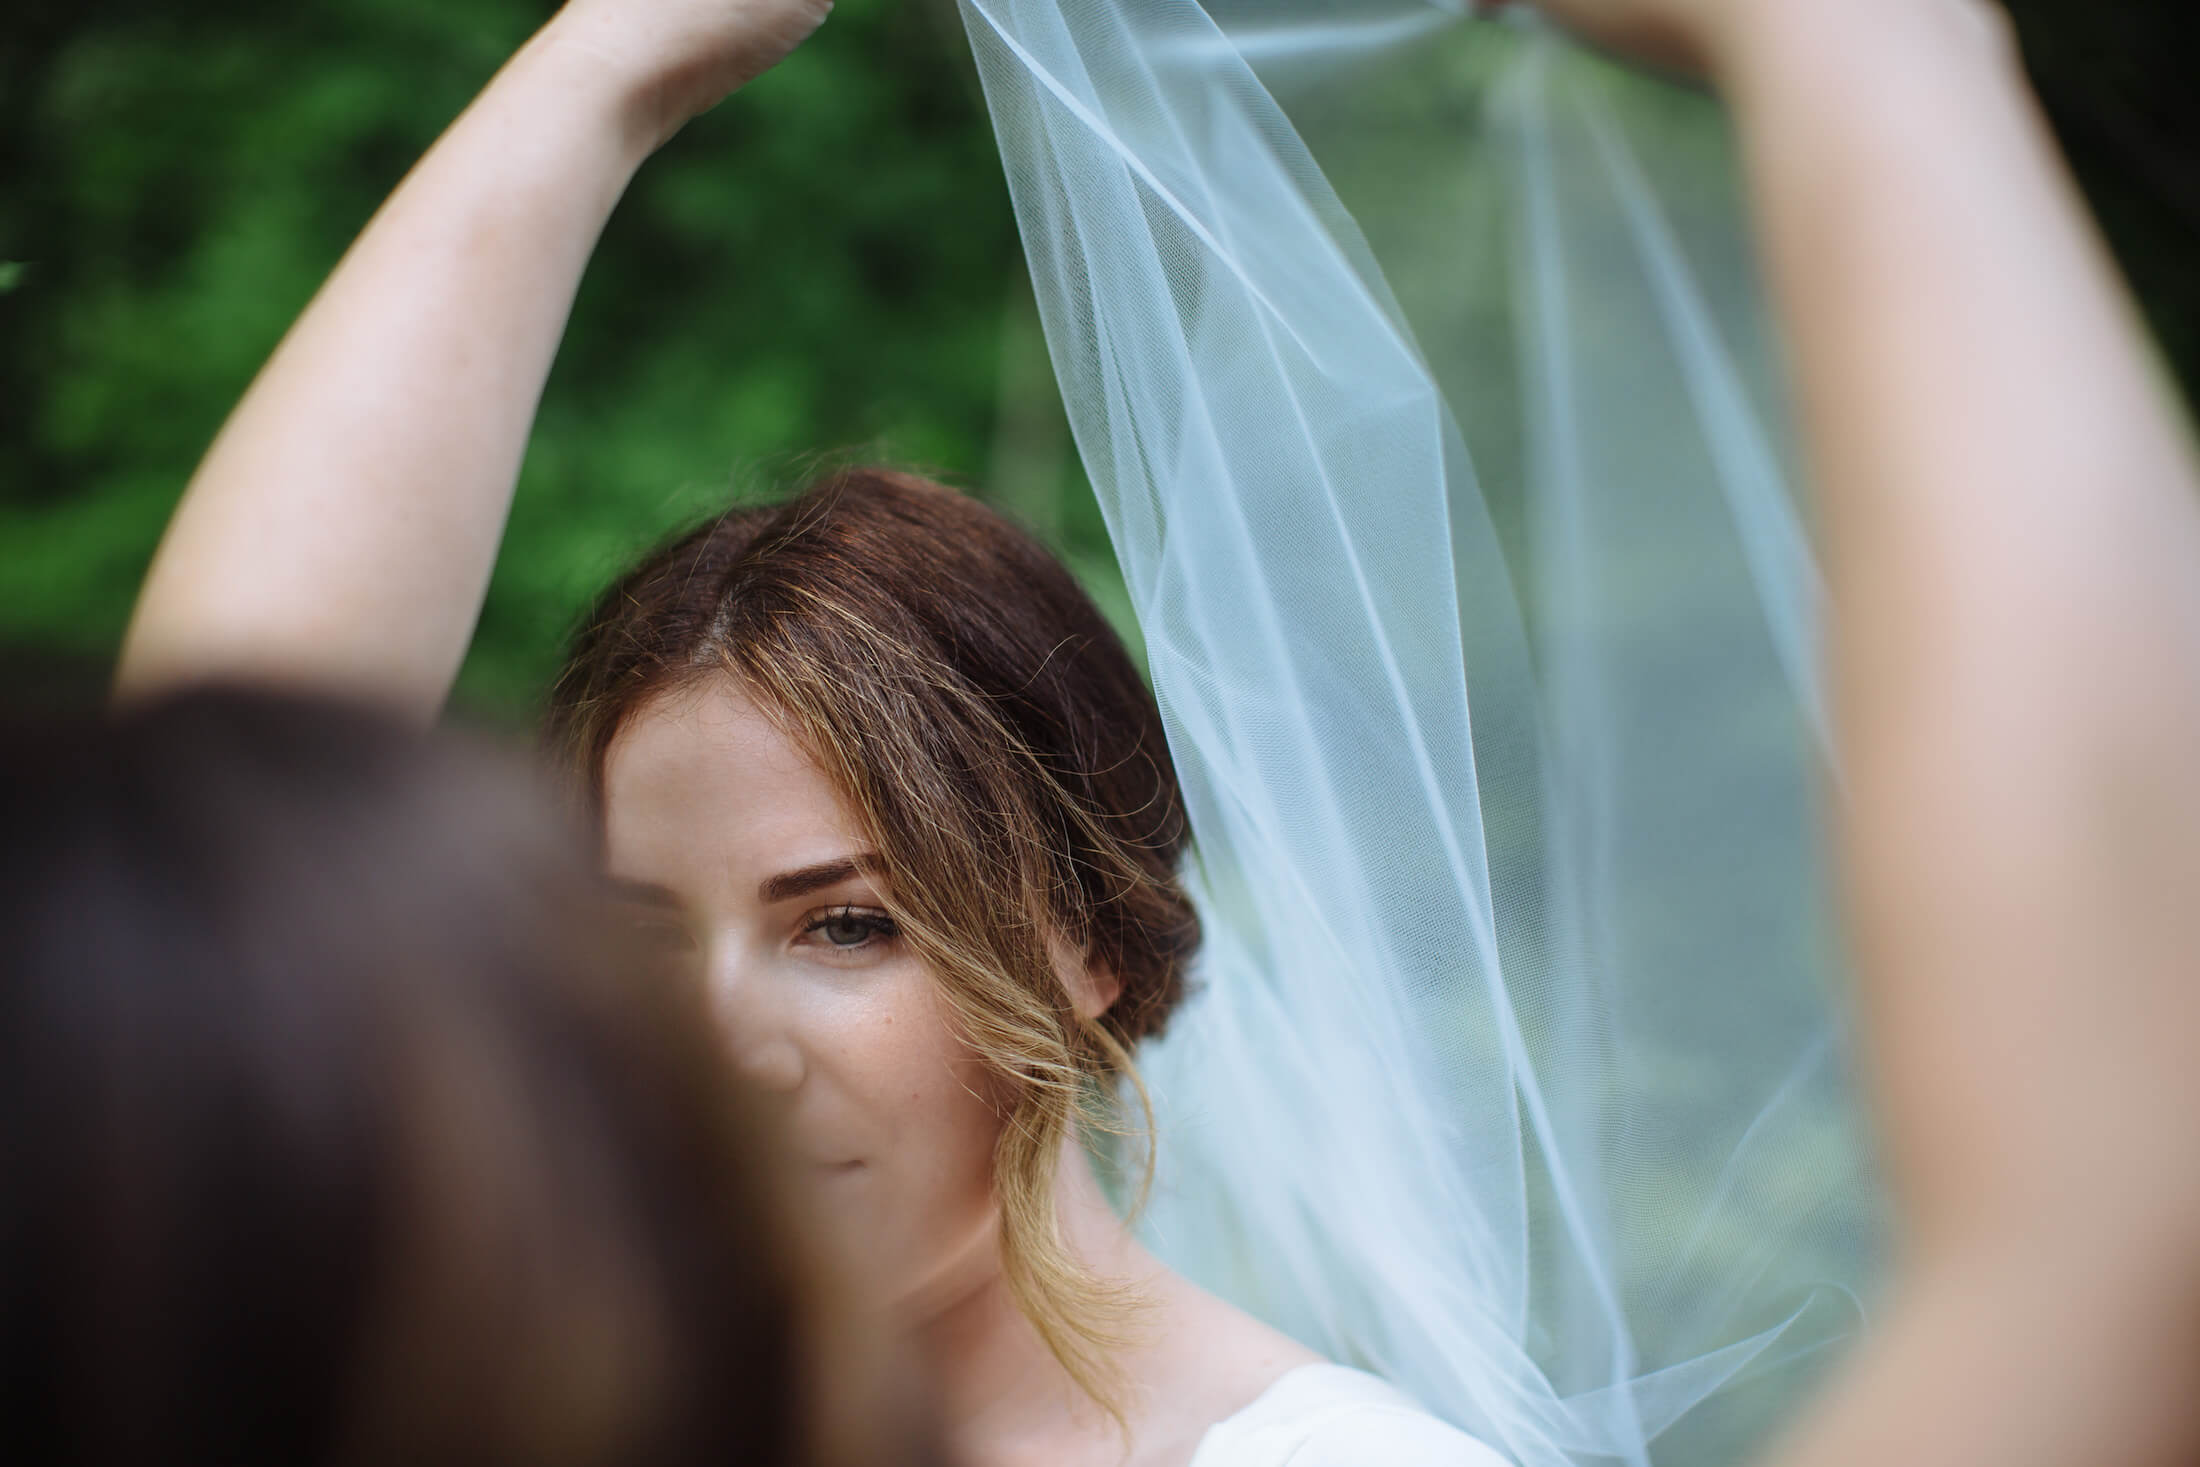 engle-olson-ray-kelly-photography-wisconsin-wedding-58.jpg